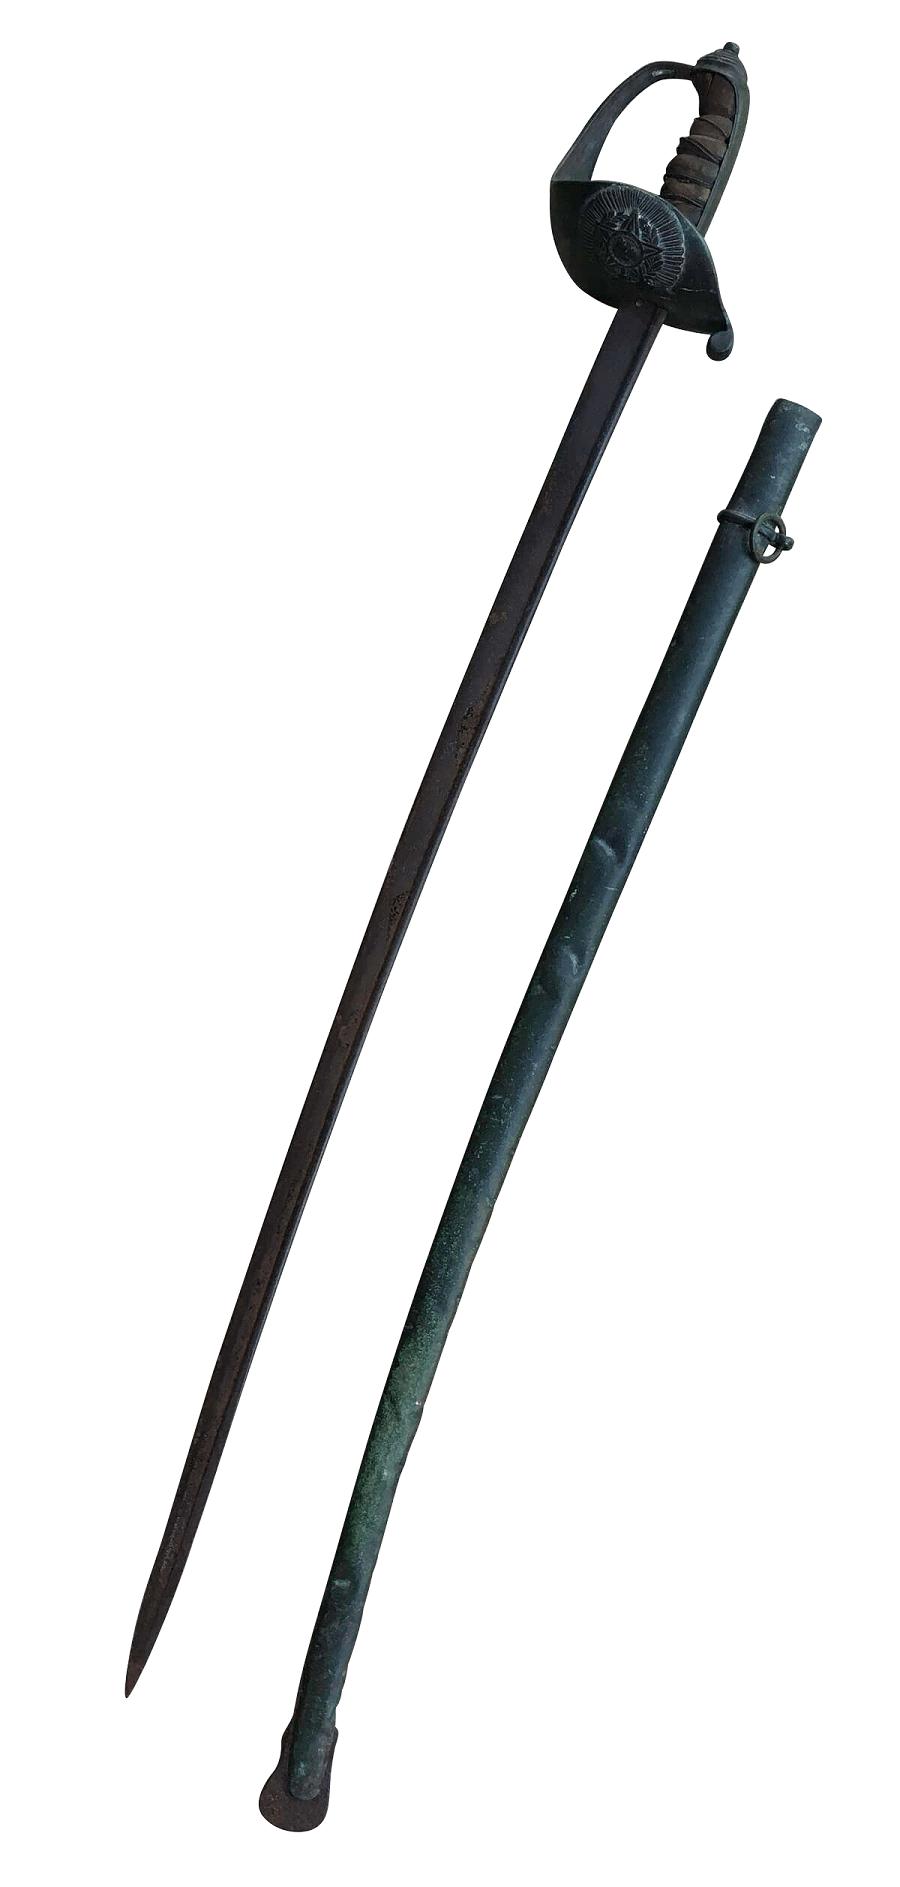 Espada Militar Brasileira Exercito Muito Antiga